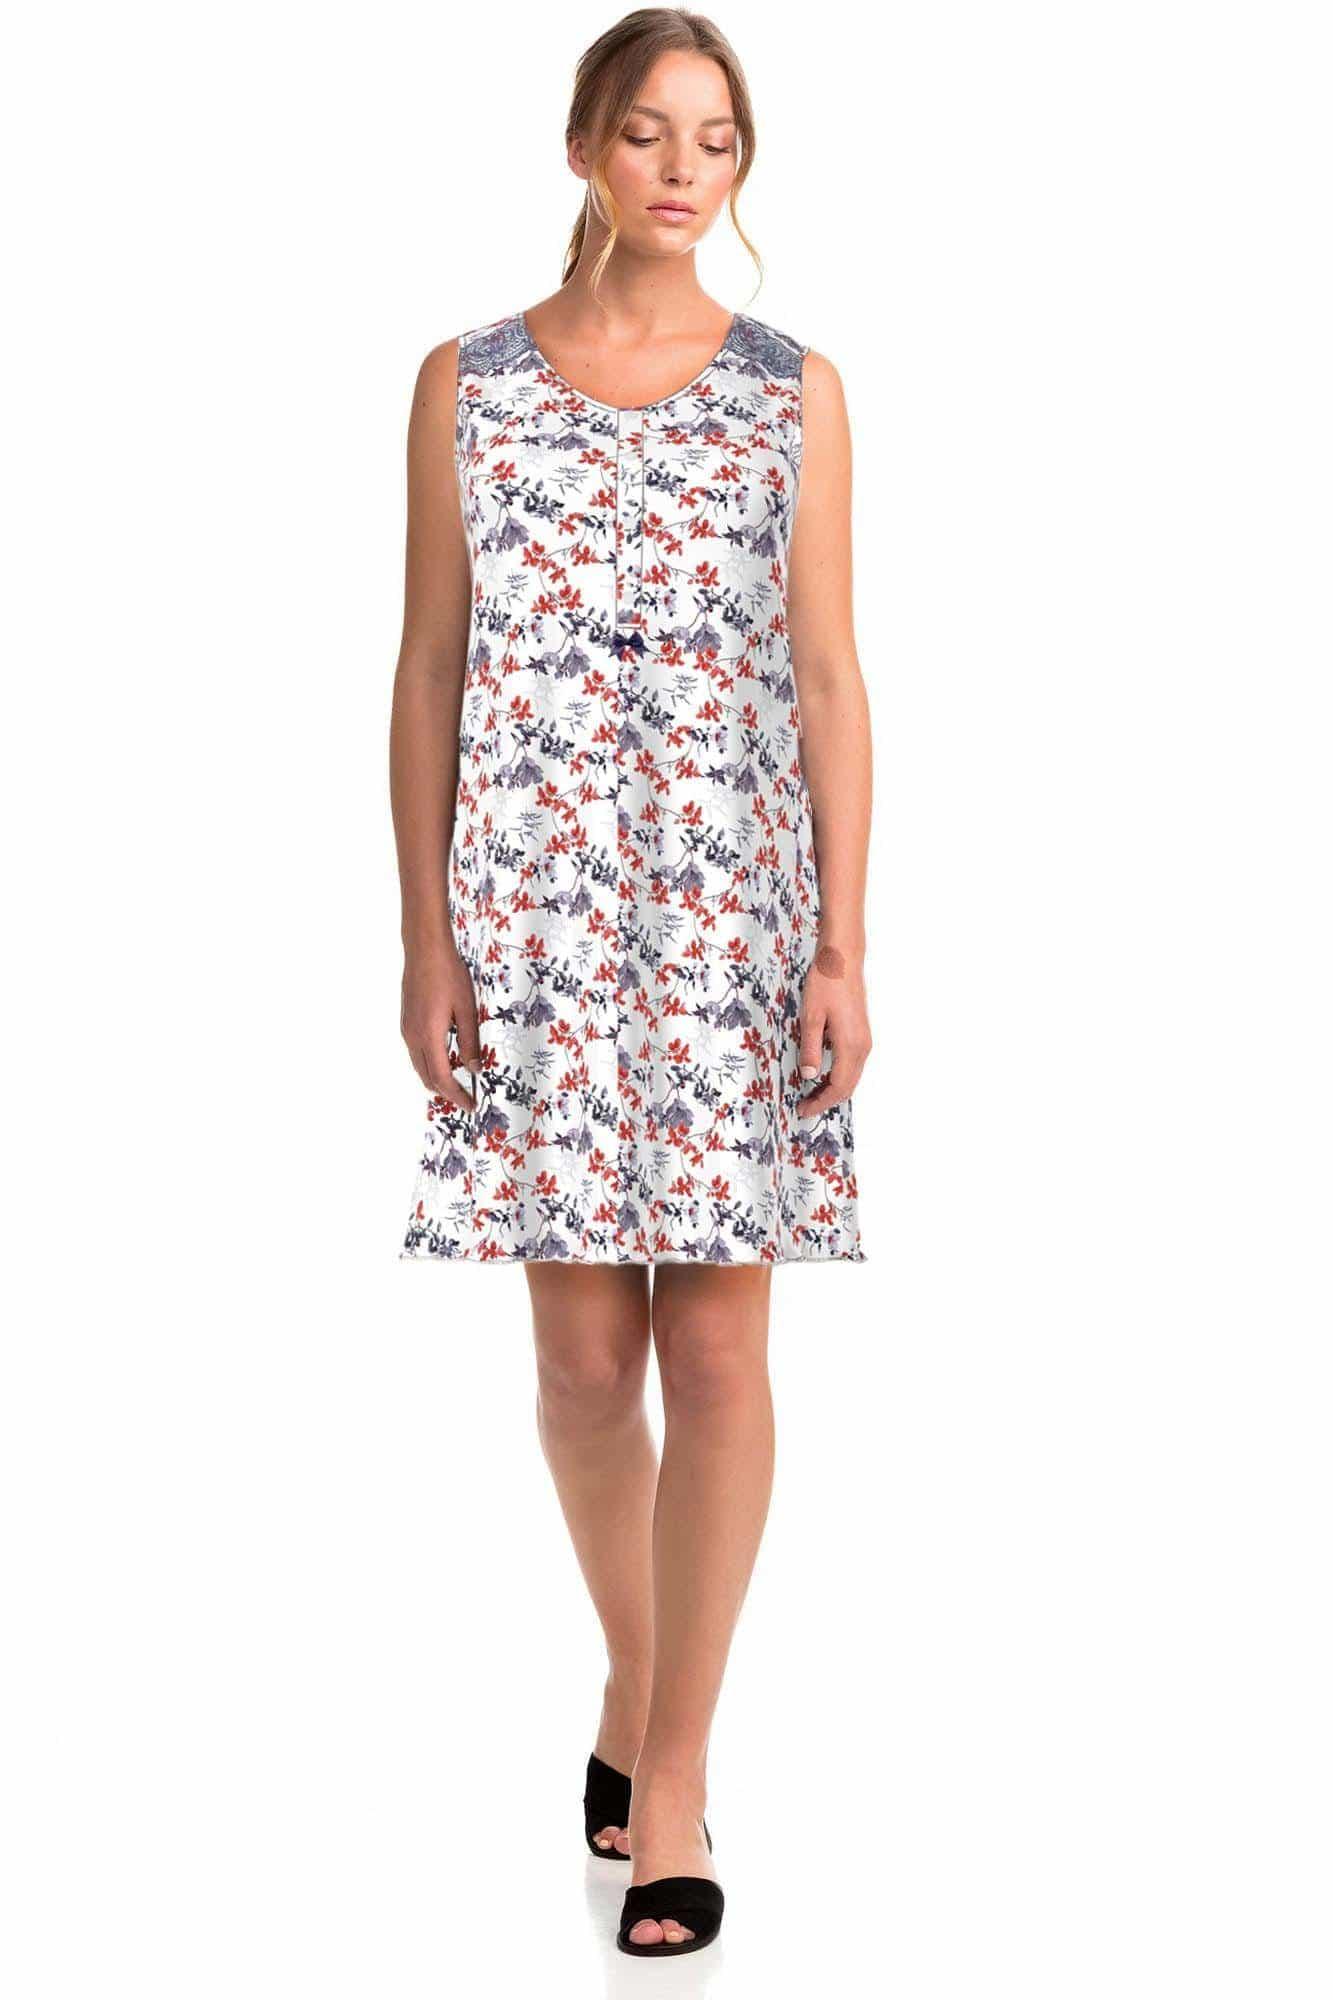 Women's Maternity Nightgown